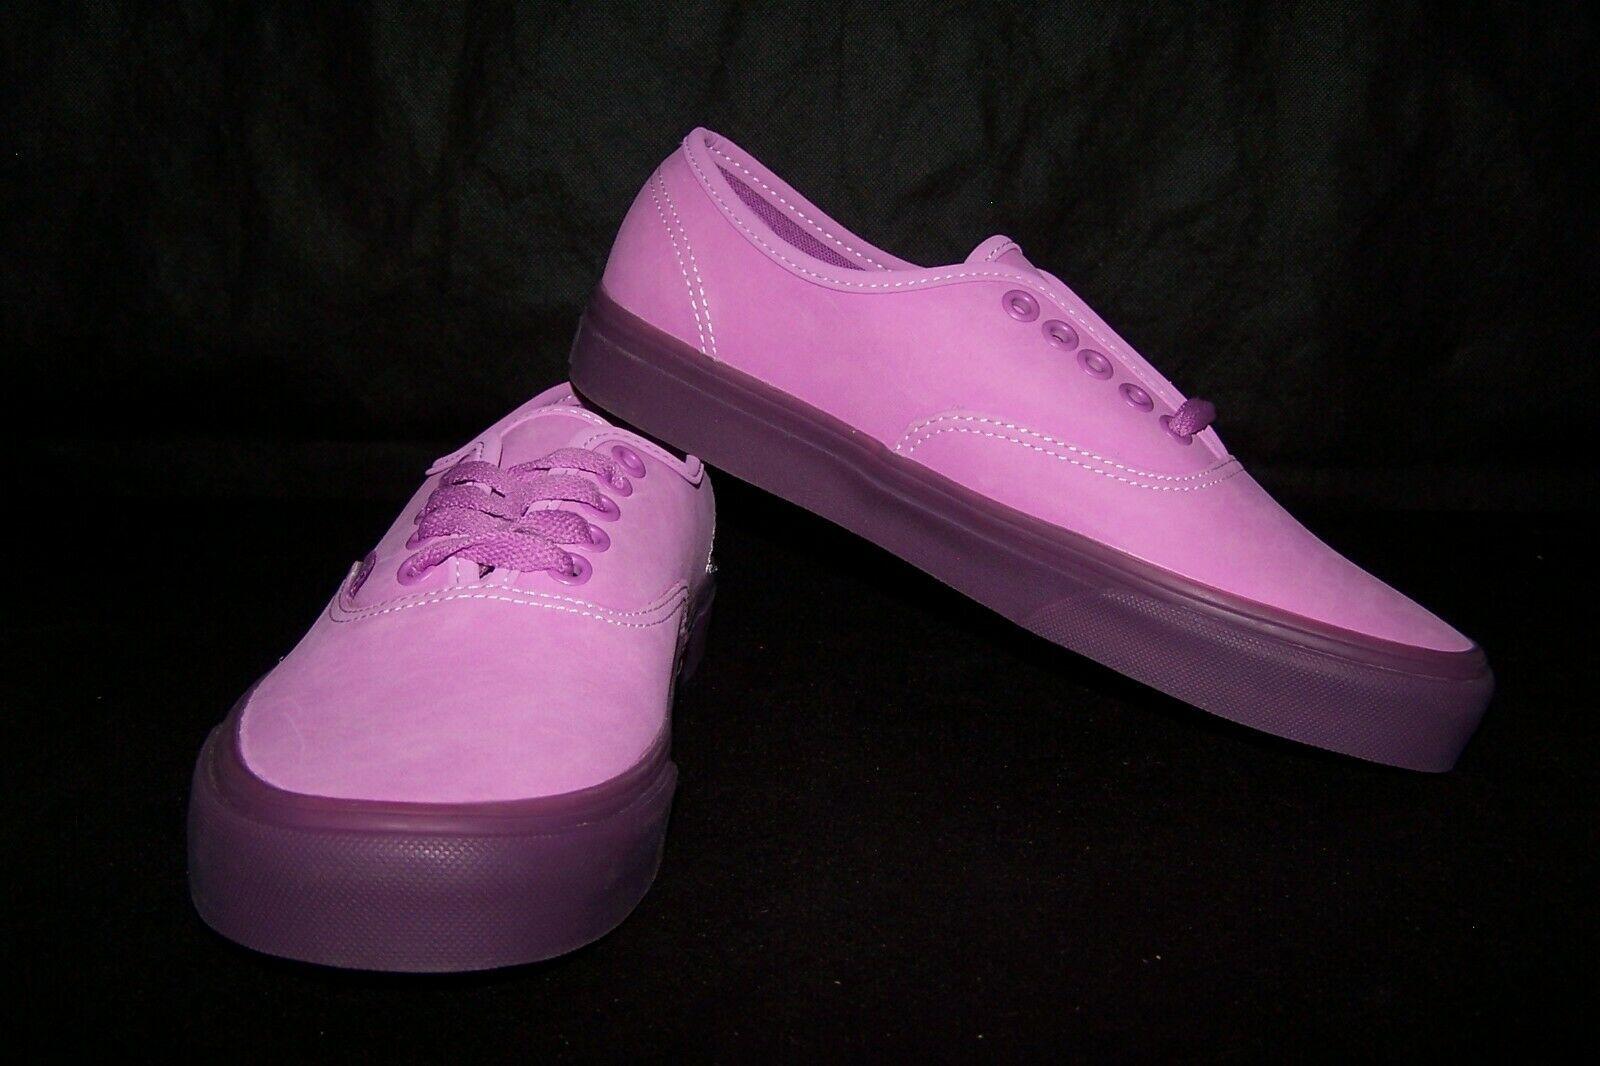 Vans shoes for sale, Skate shoes